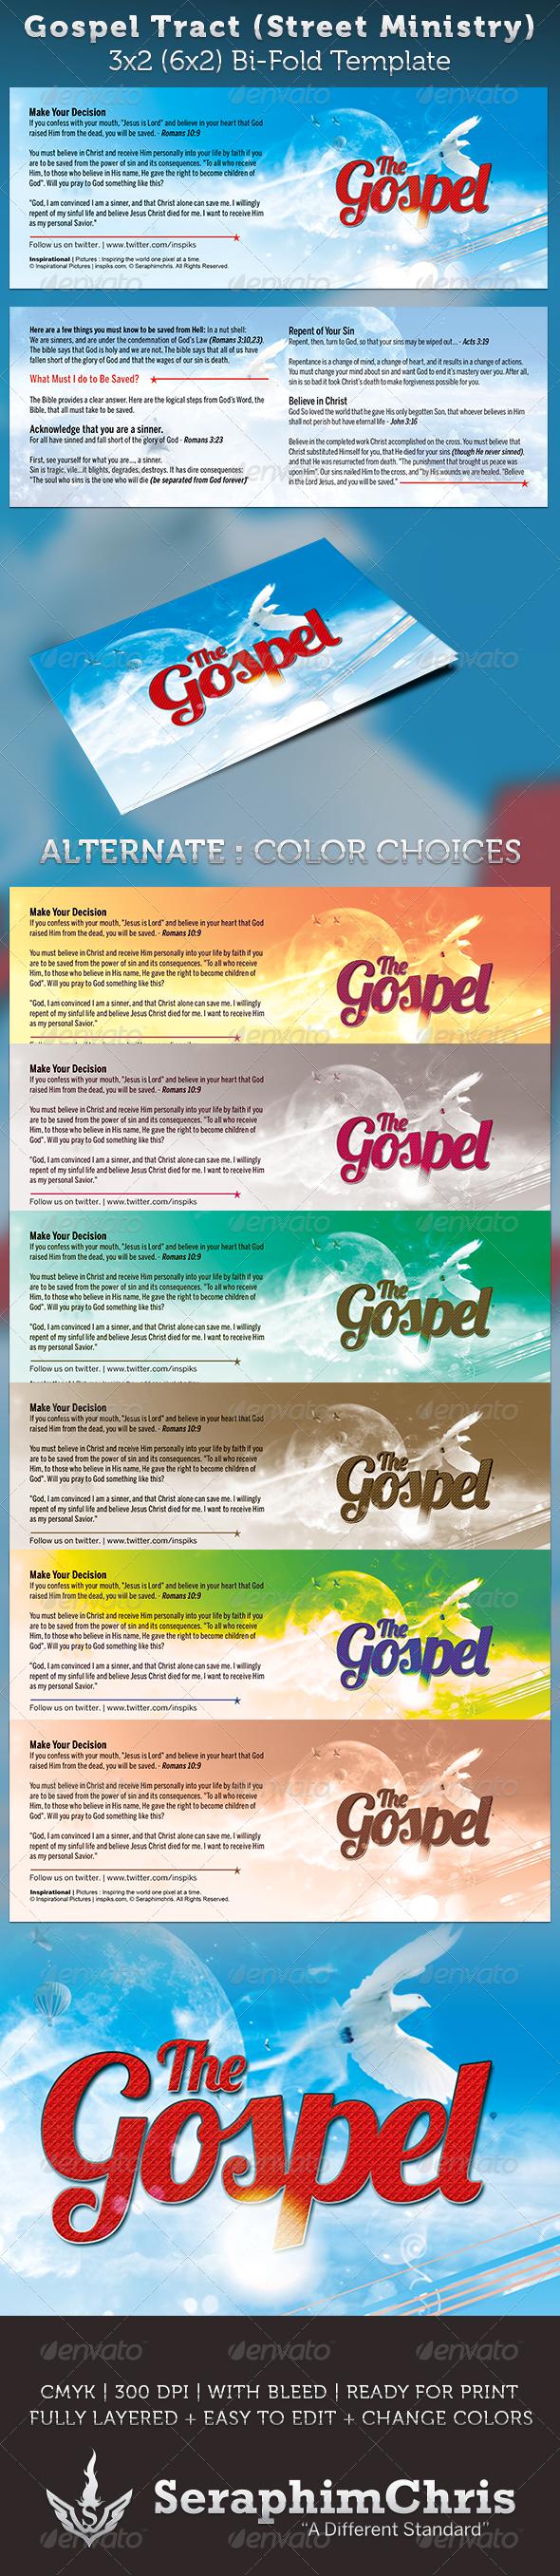 Gospel Tract Bi-Fold Template